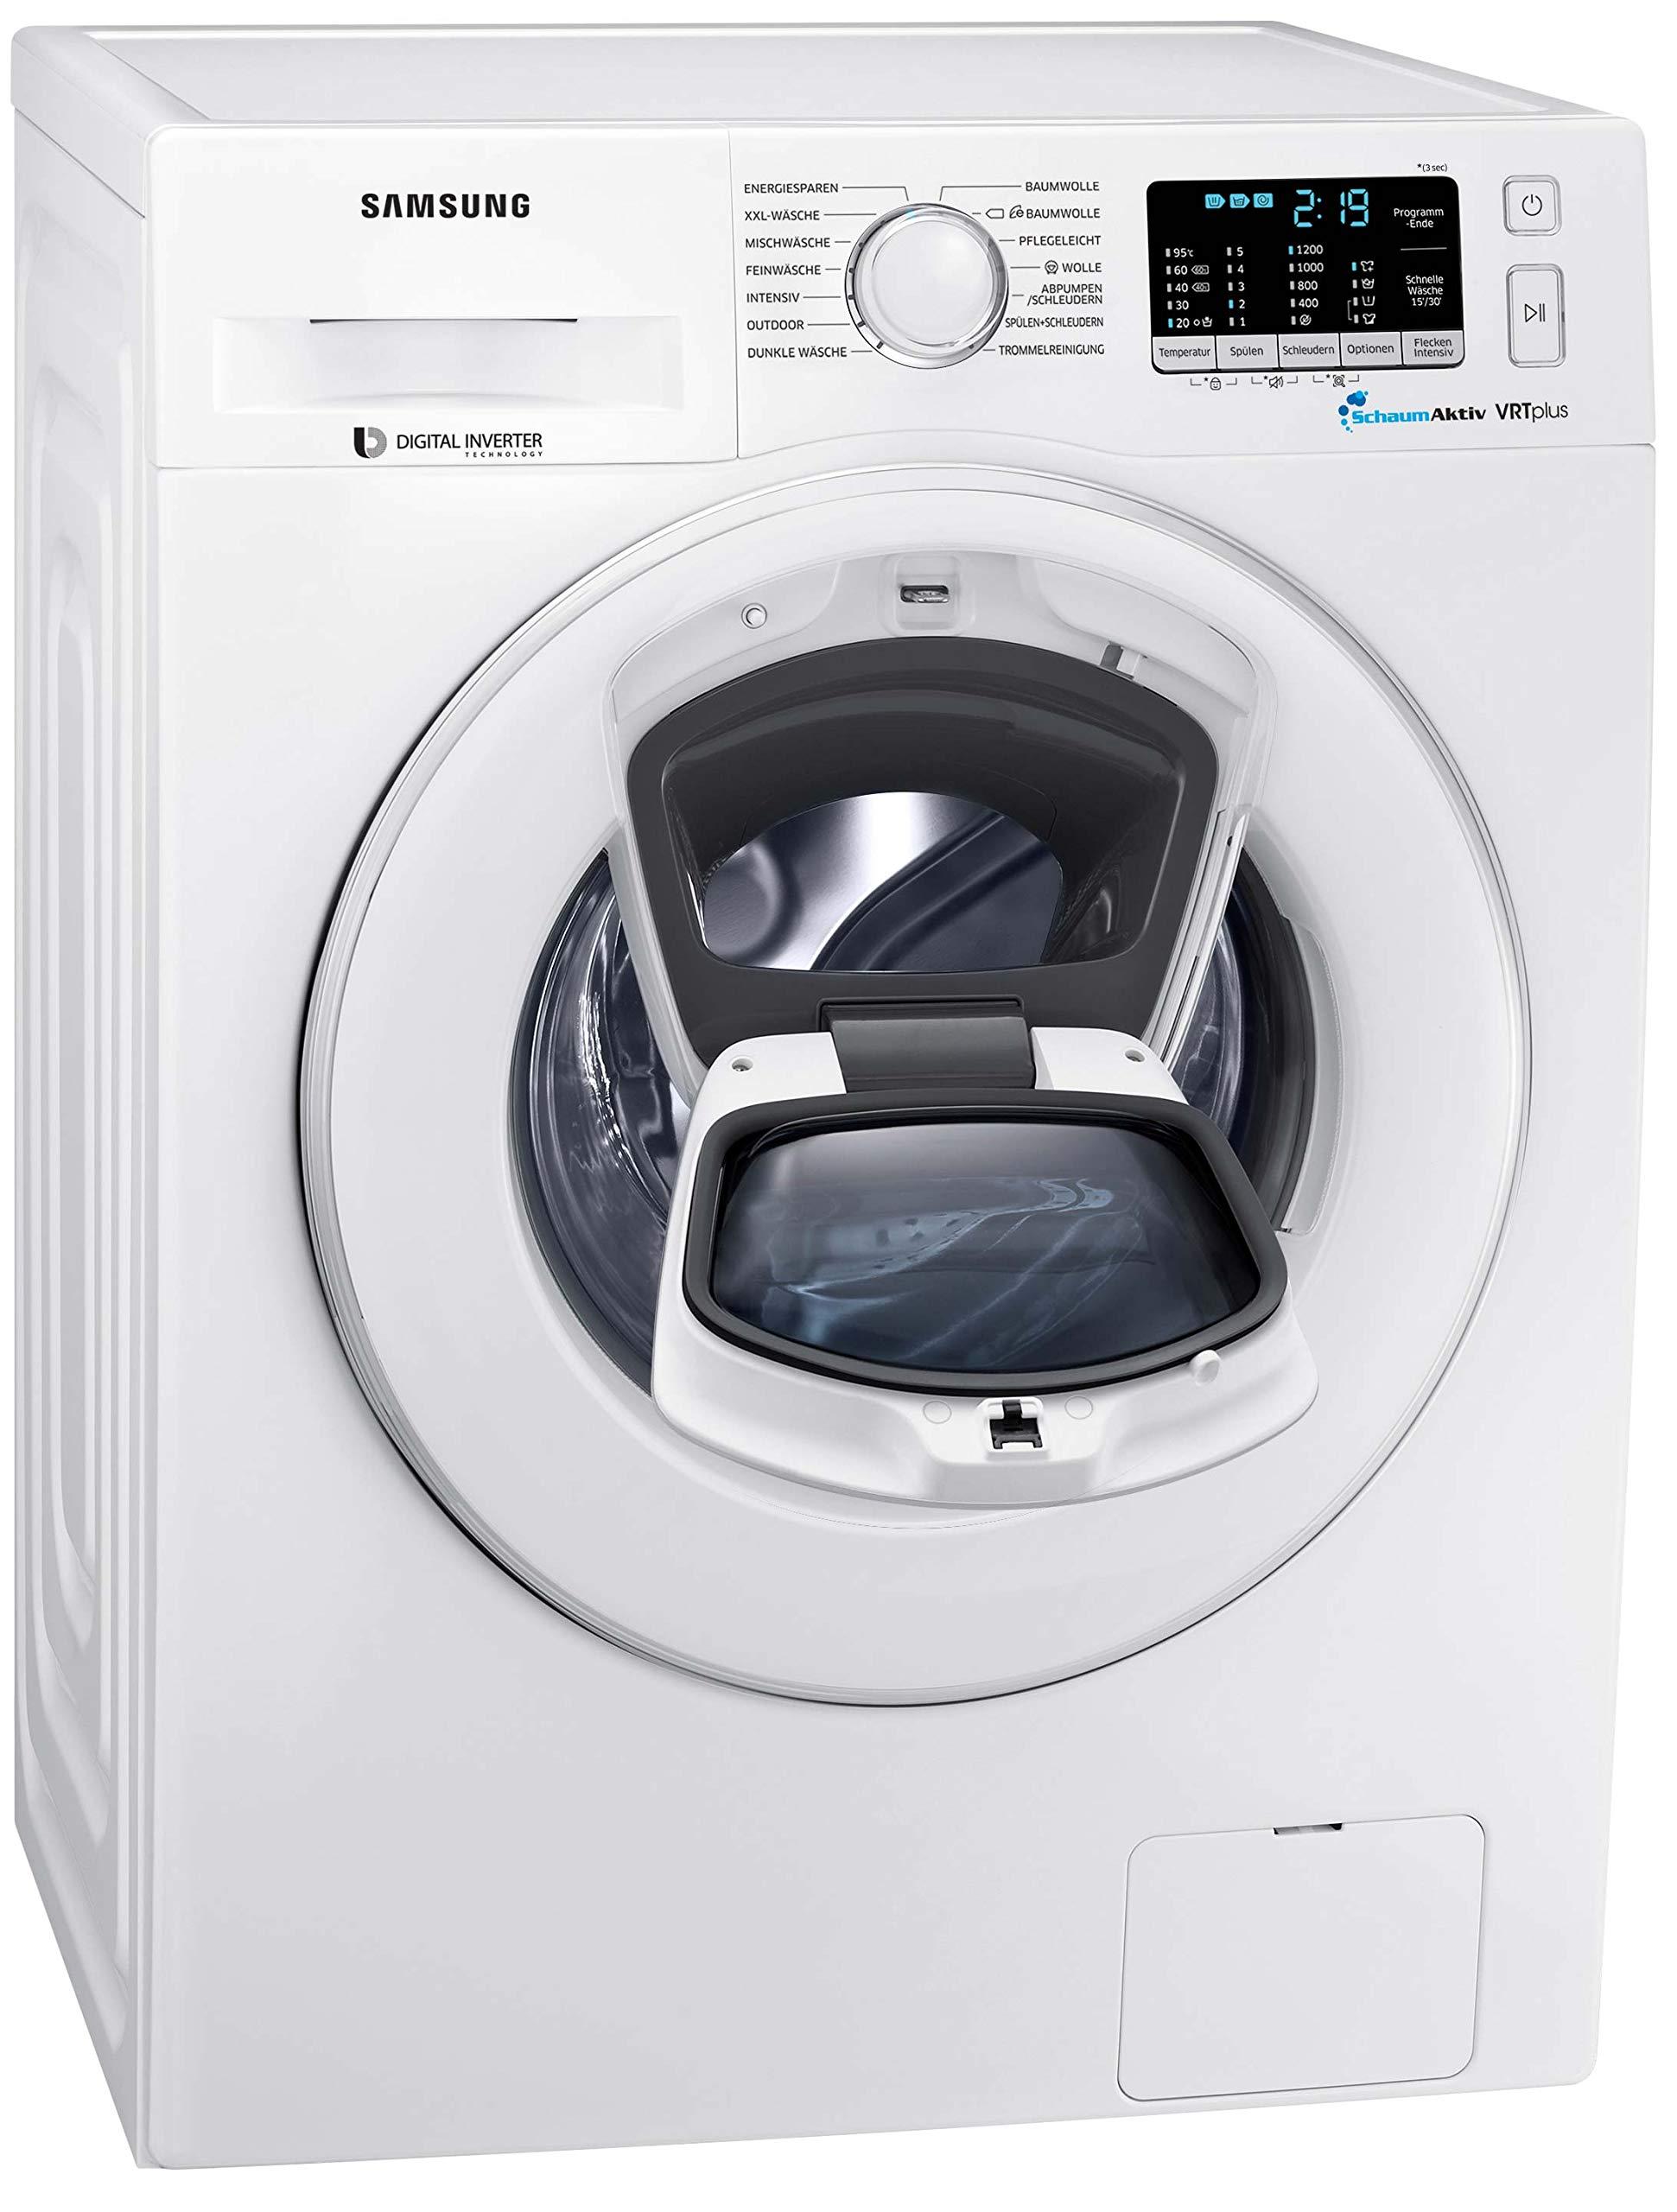 Samsung-WW5500-SLIM-WW82K52A0XWEG-Waschmaschine-8-kg-1200-Umin-A-AddWash-Schaumaktiv-Technologie